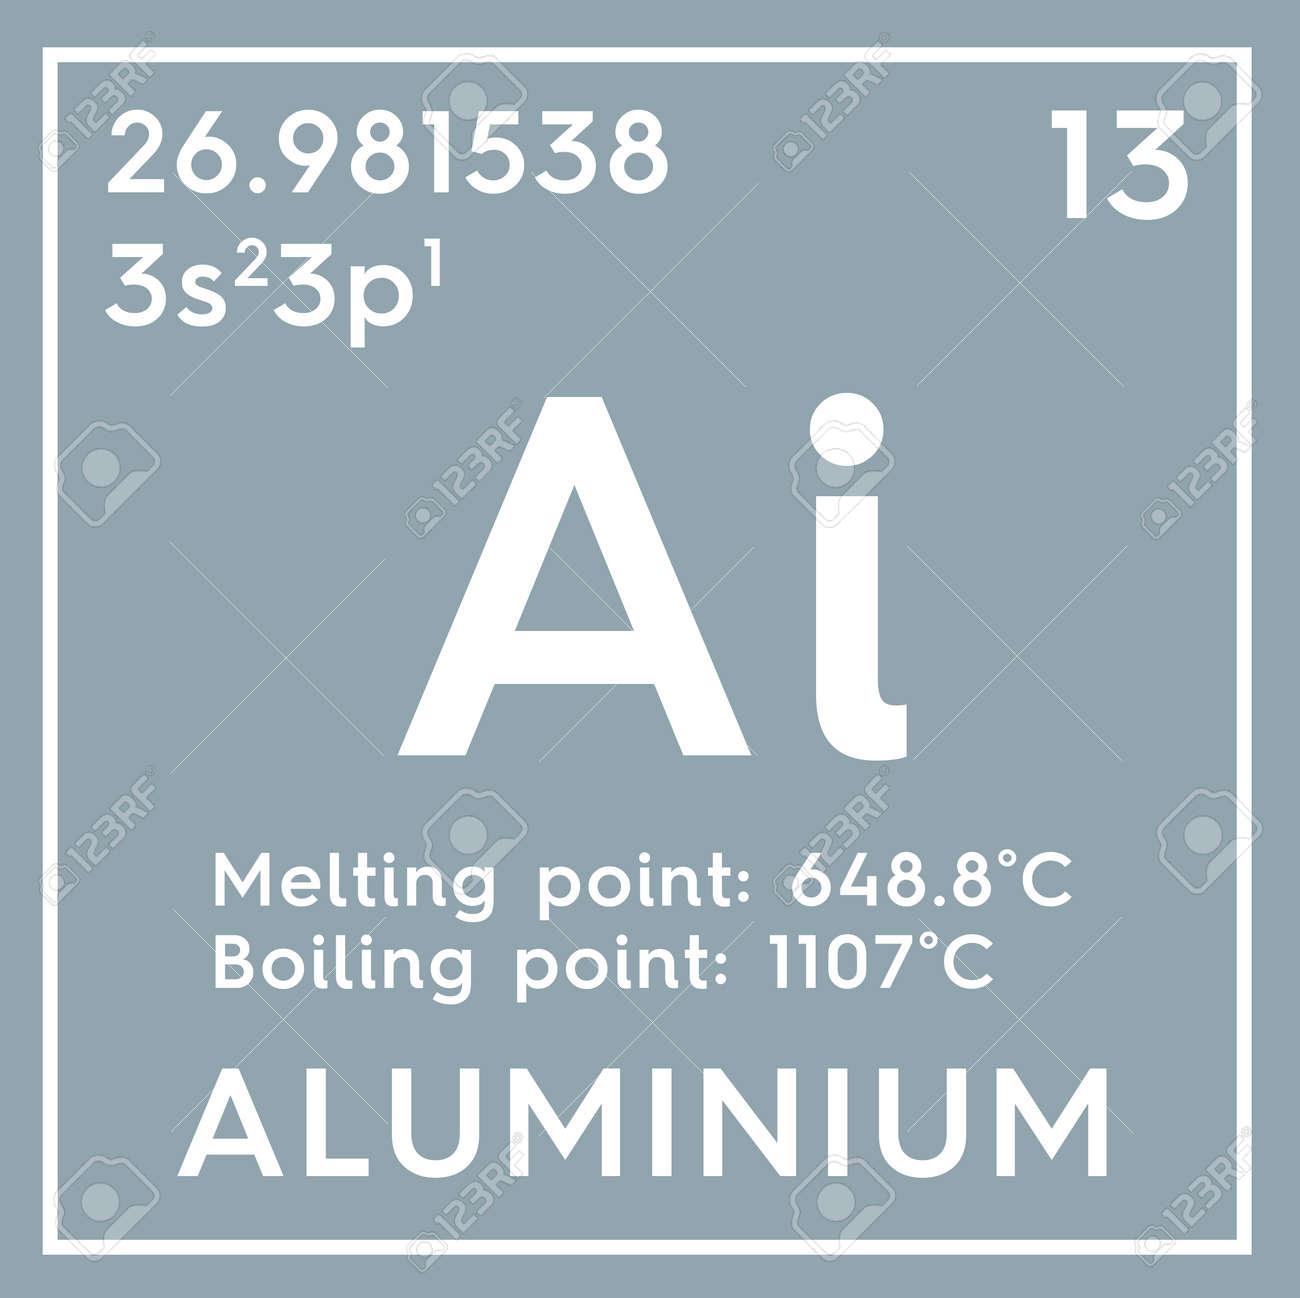 Aluminum post transition metals chemical element of mendeleevs aluminum post transition metals chemical element of mendeleevs periodic table aluminum in urtaz Choice Image